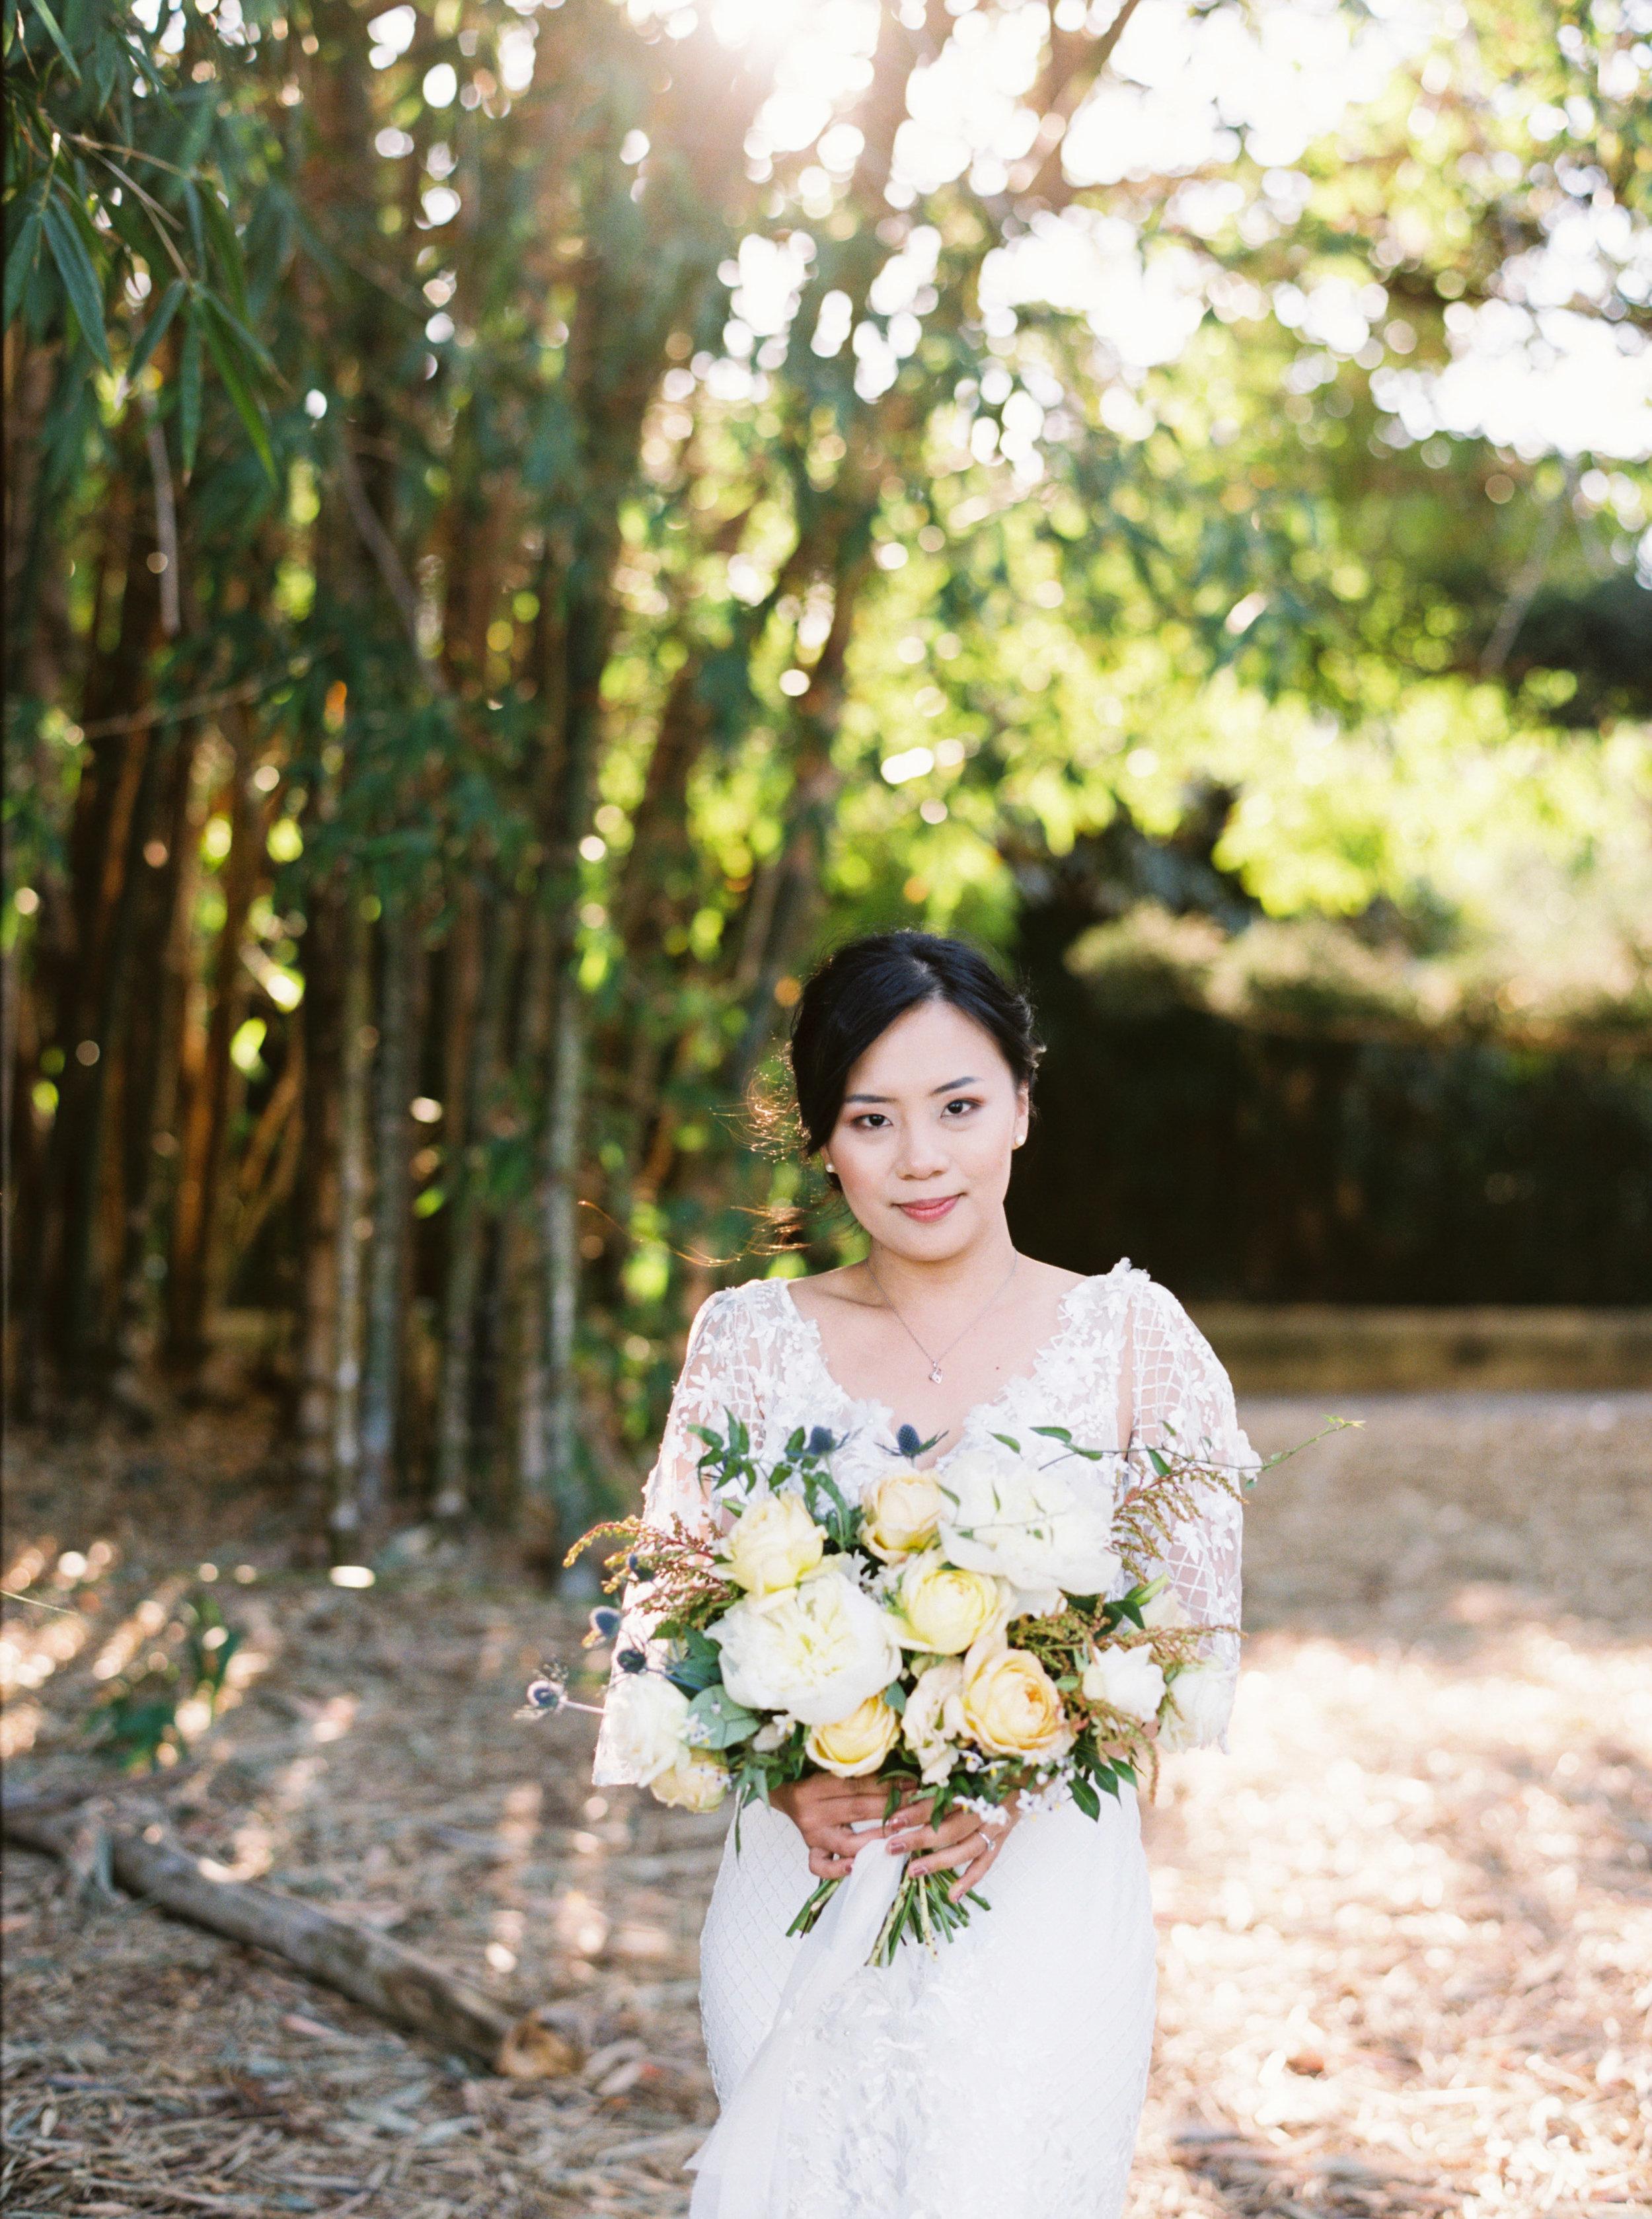 00018- Australia Sydney Wedding Photographer Sheri McMahon.jpg